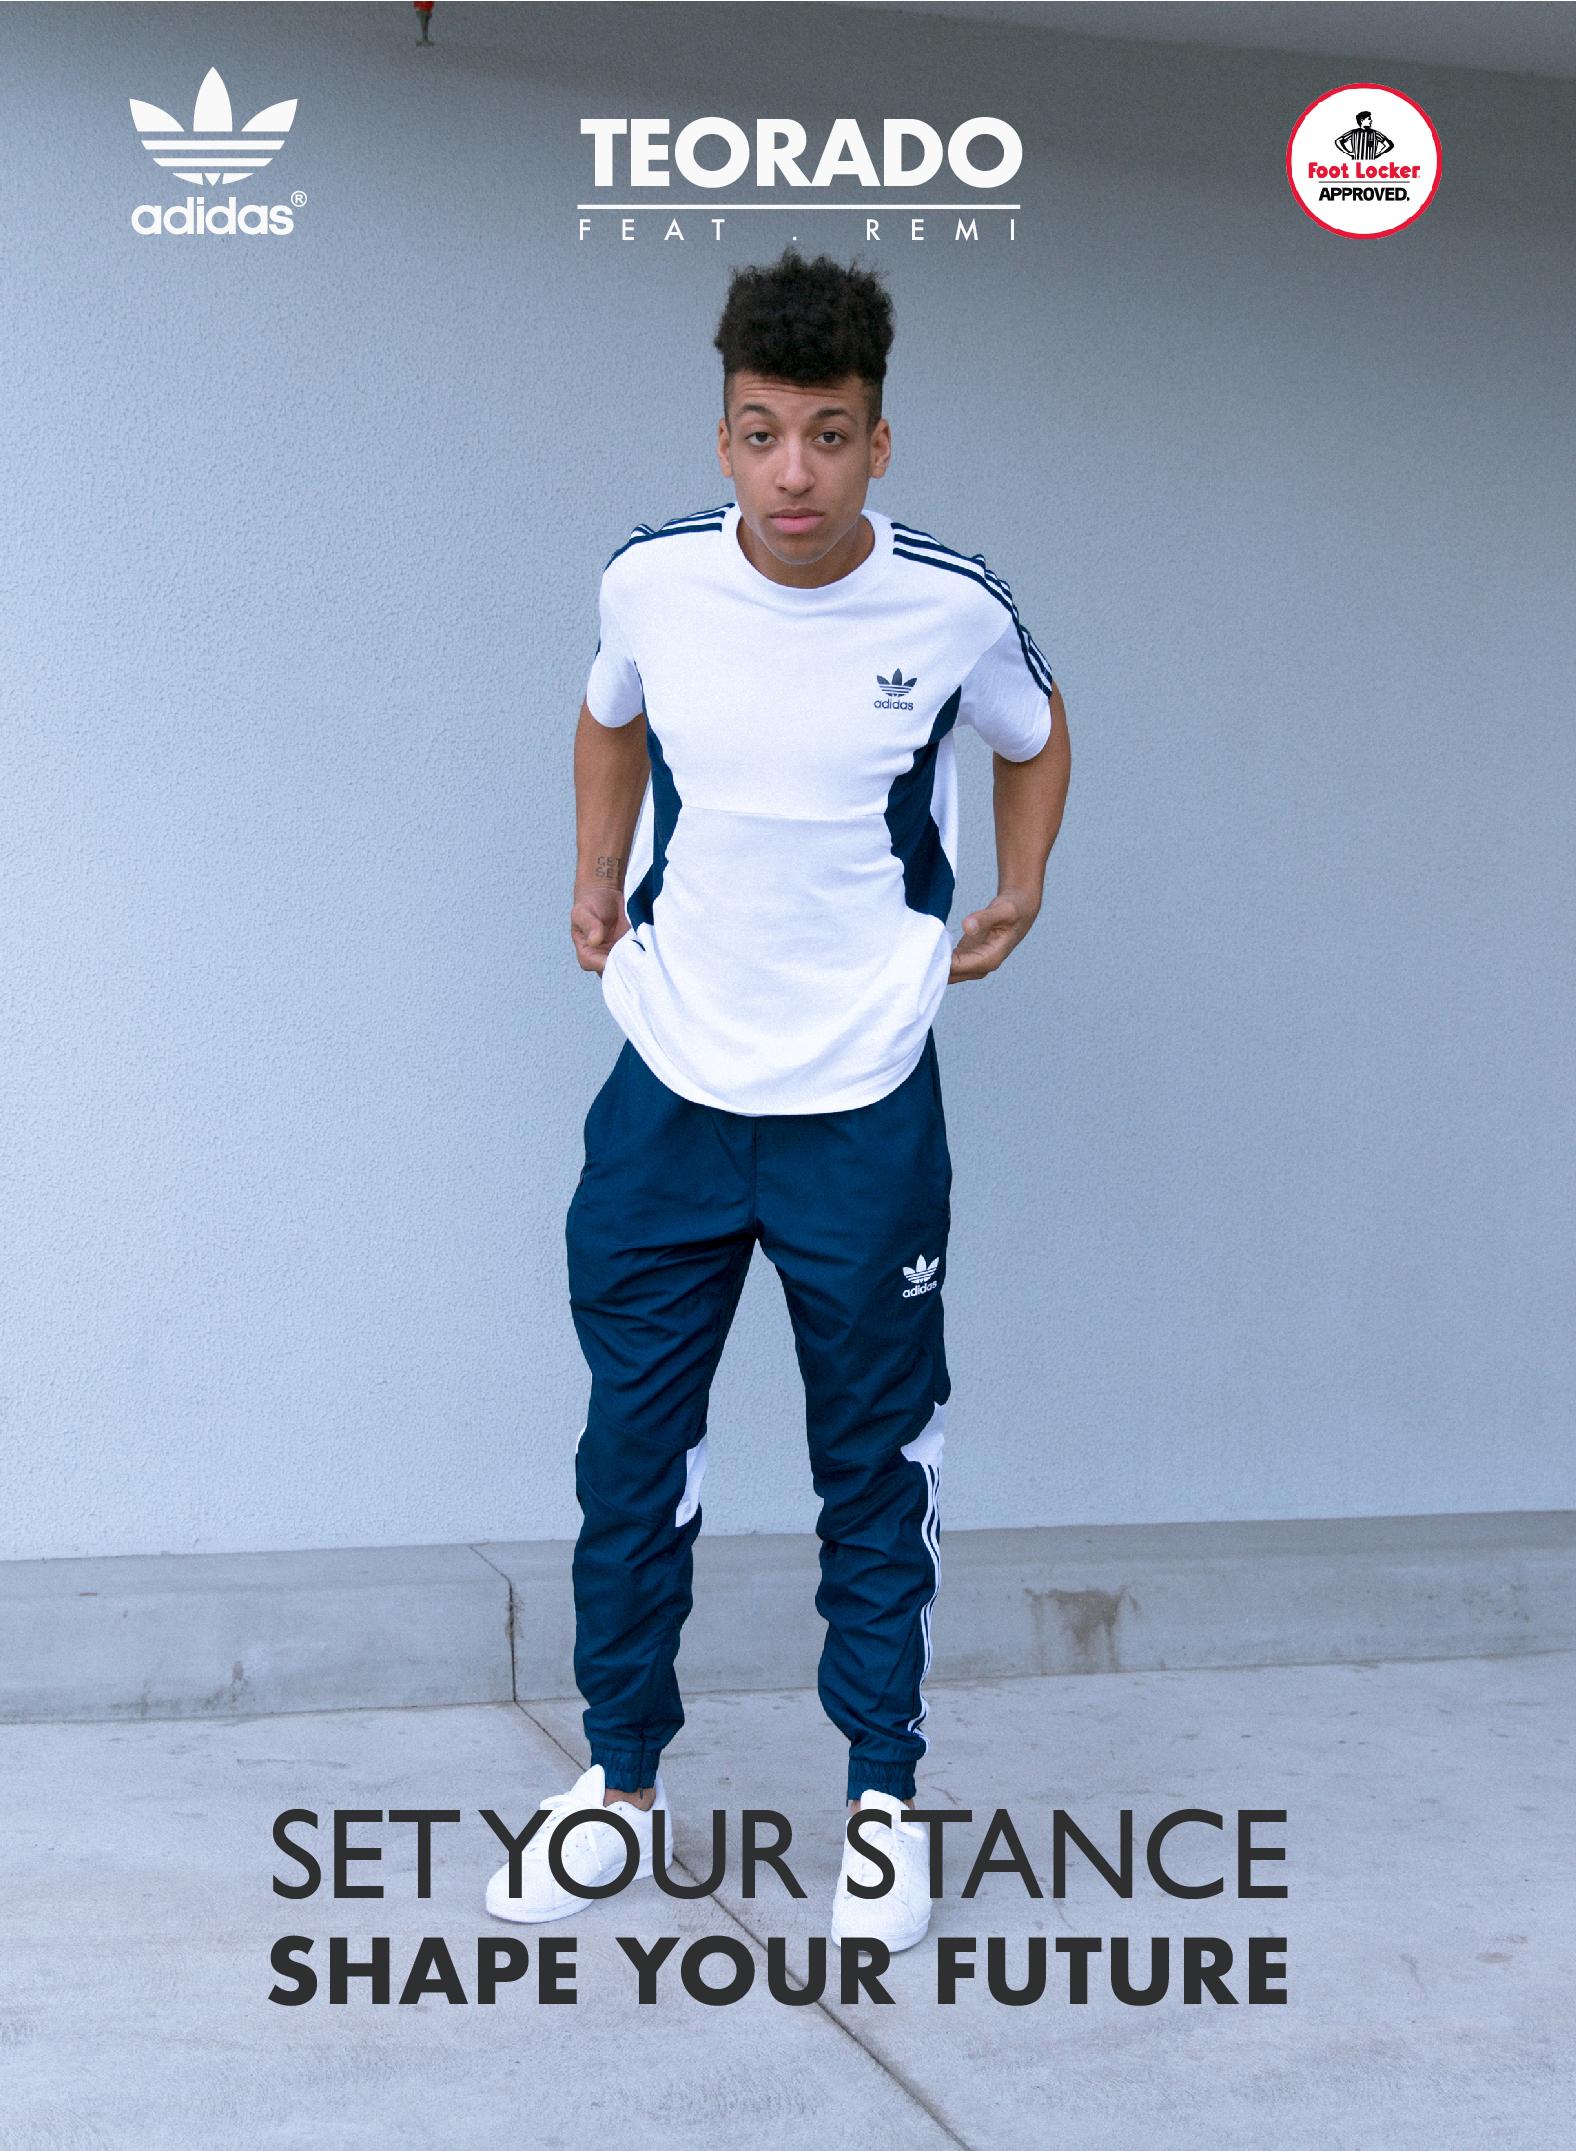 remi-adidas-shape-your-future-foot-locker-crop.jpg